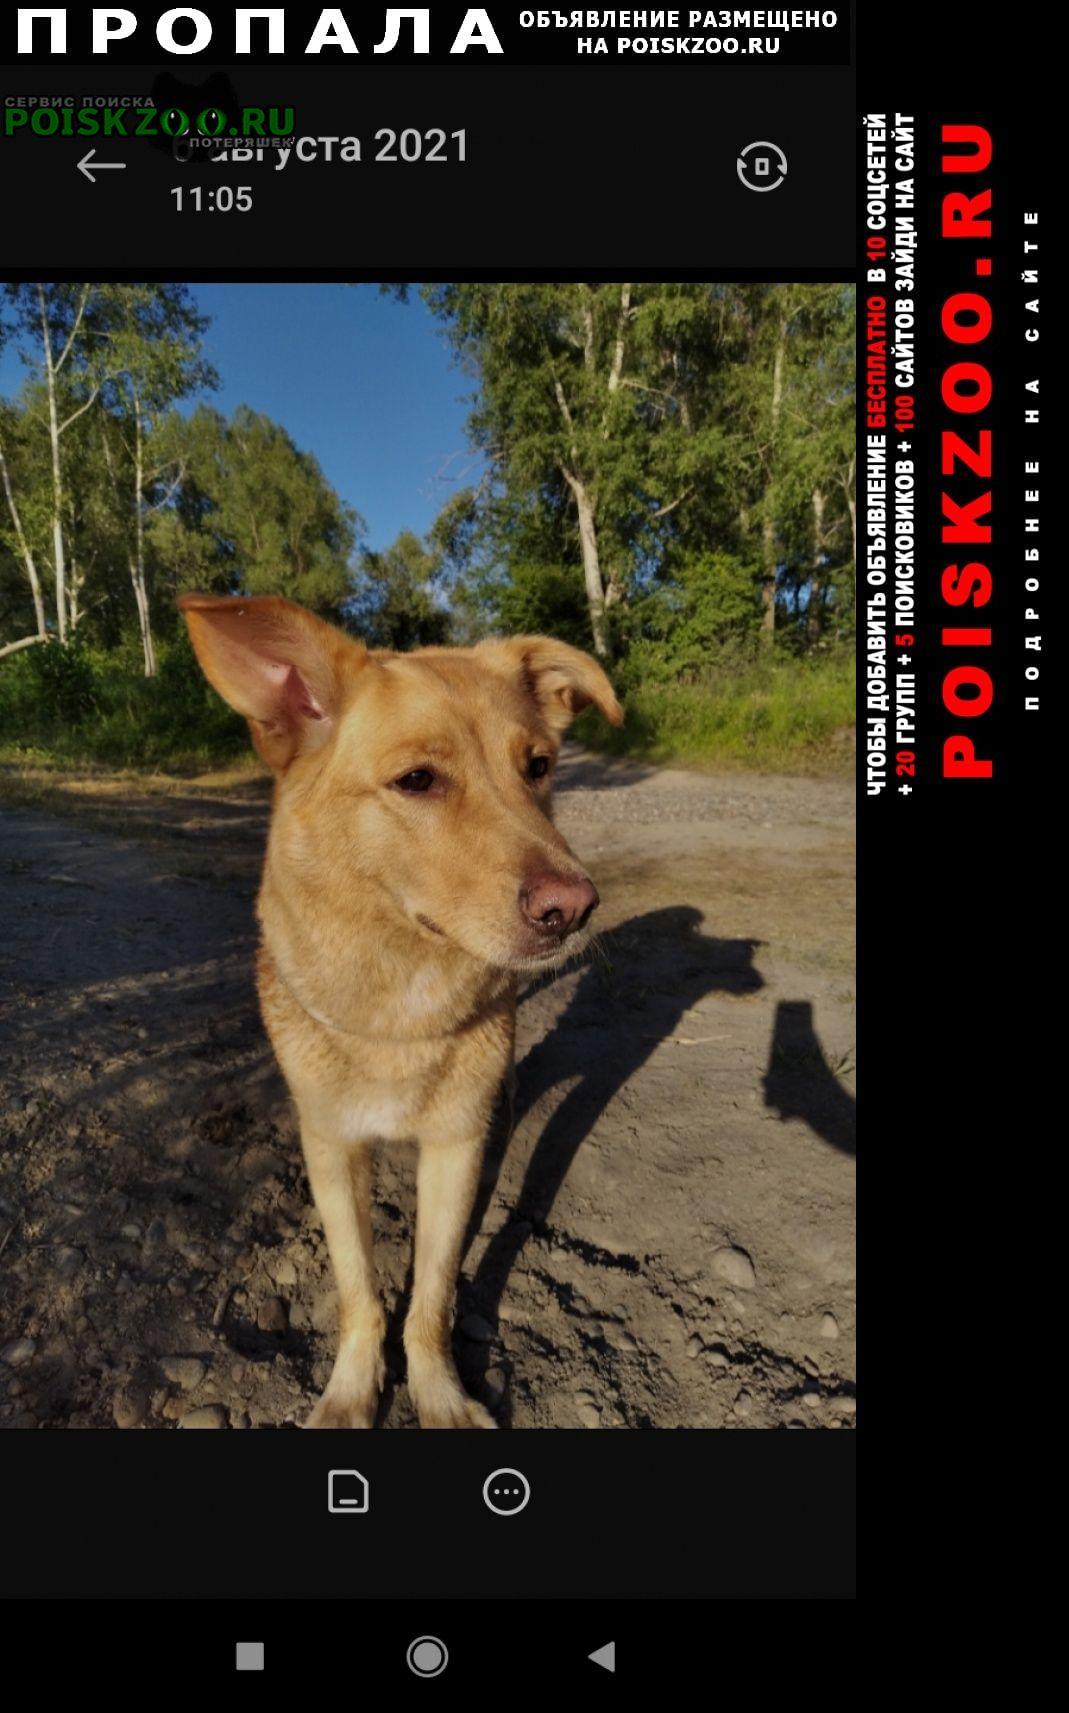 Пропала собака Бийск